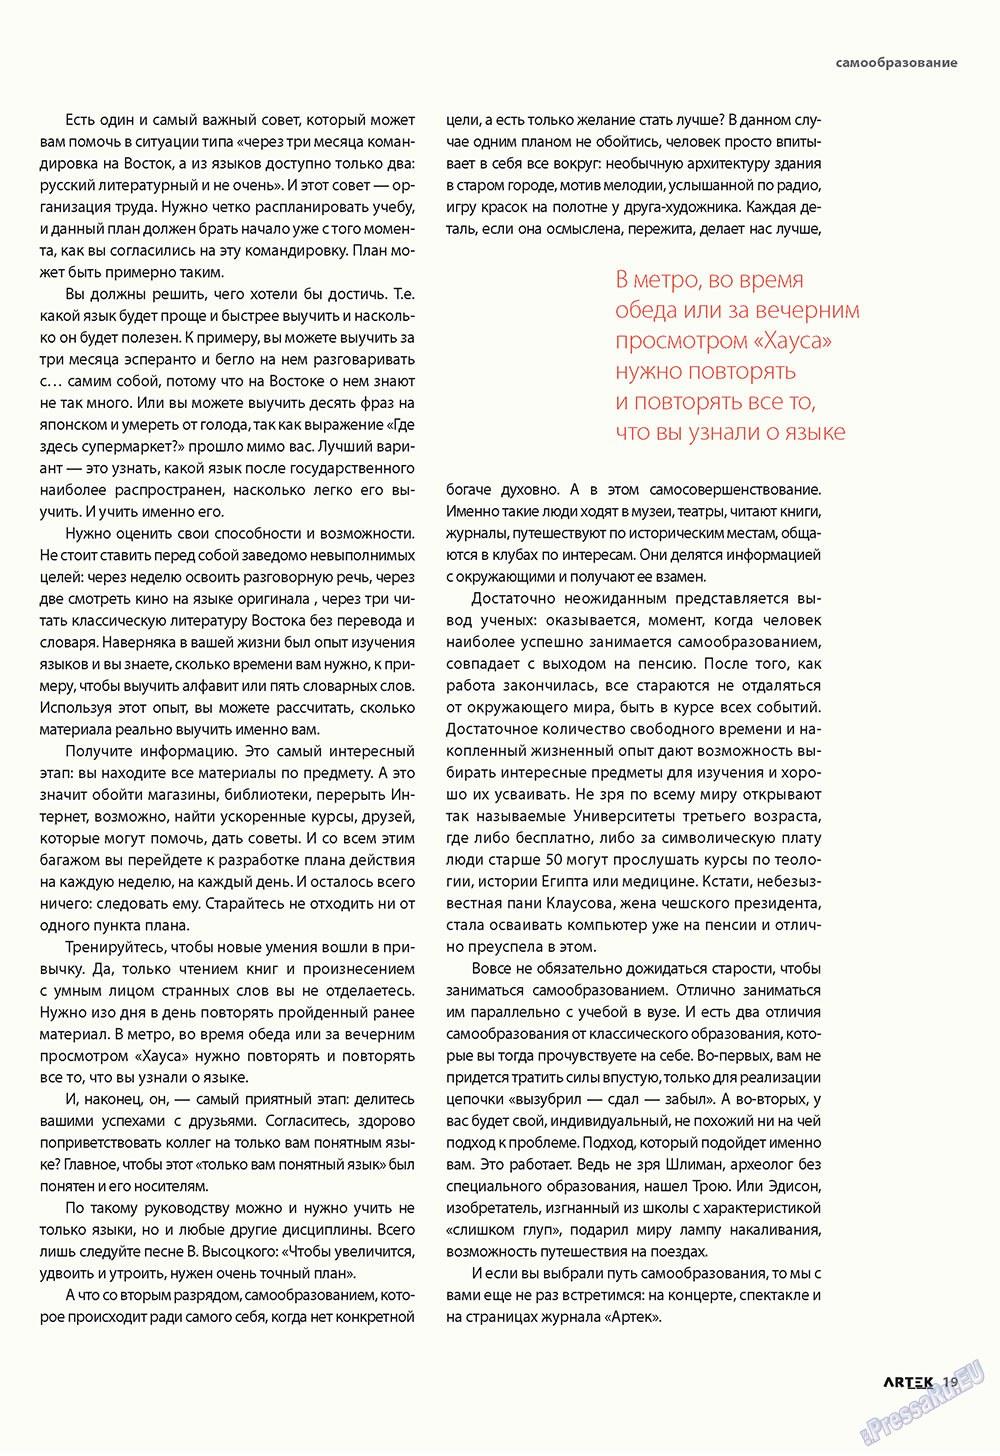 Артек (журнал). 2009 год, номер 4, стр. 19